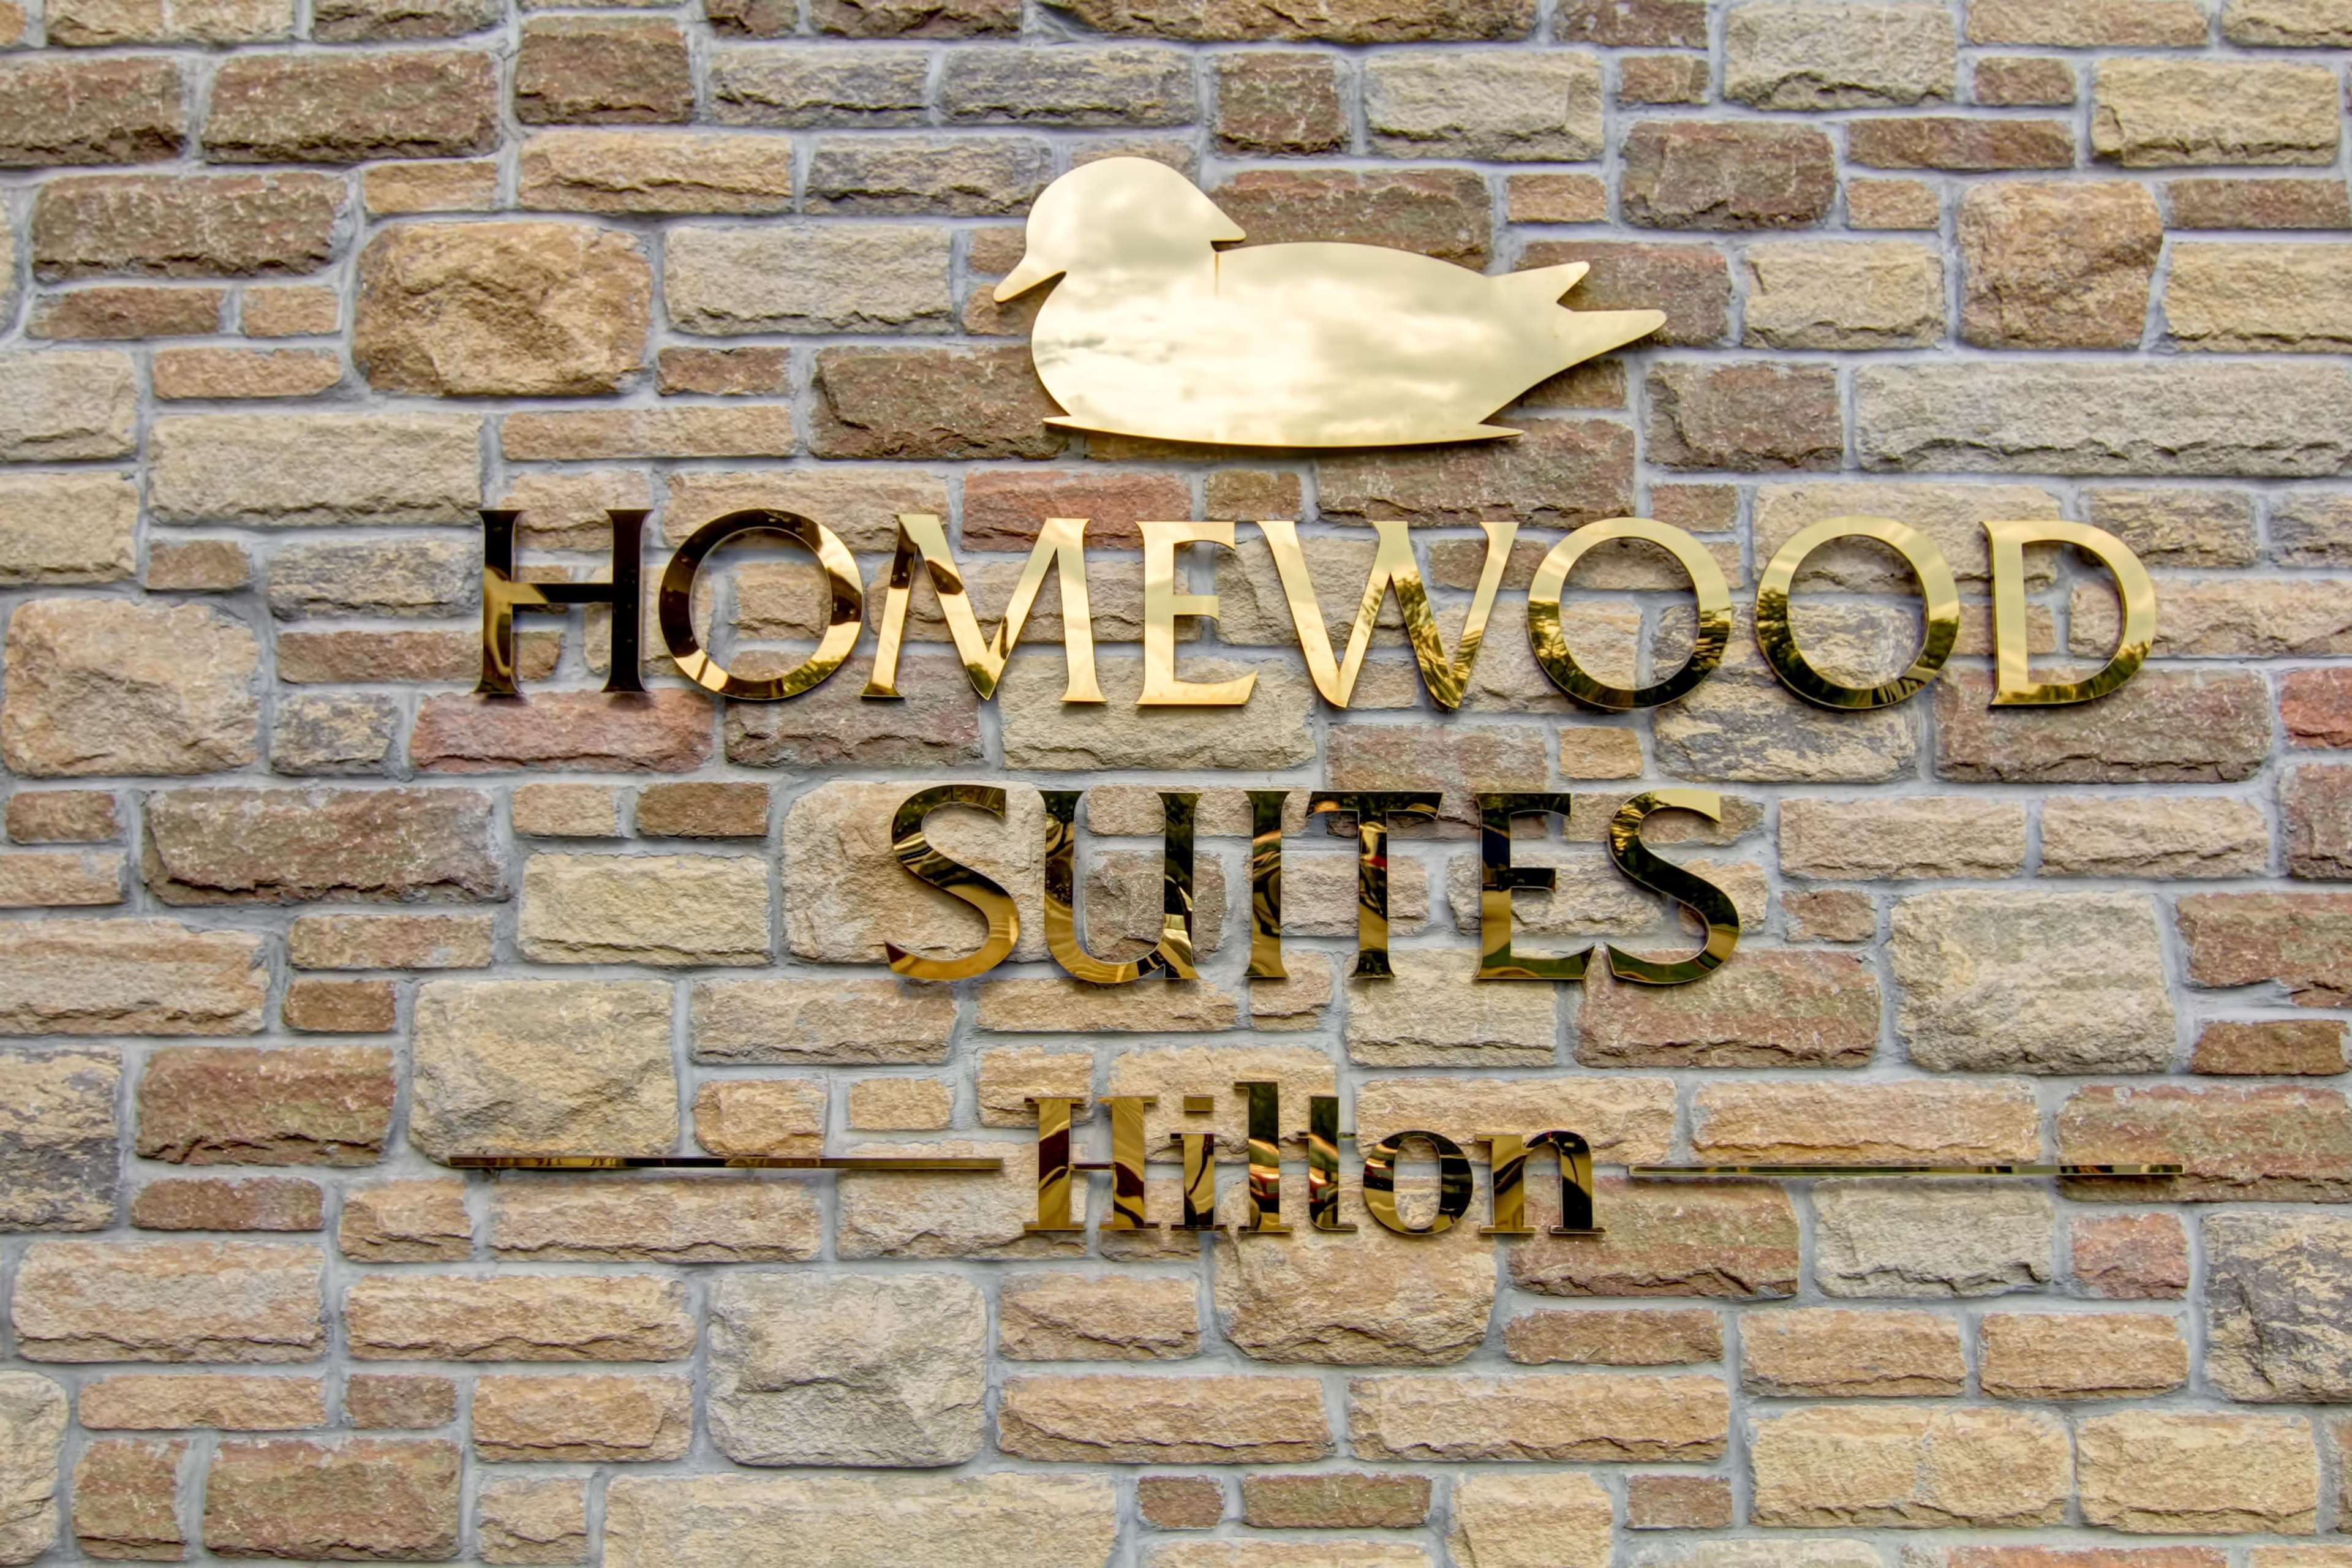 Homewood Suites by Hilton Cincinnati Airport South-Florence image 40